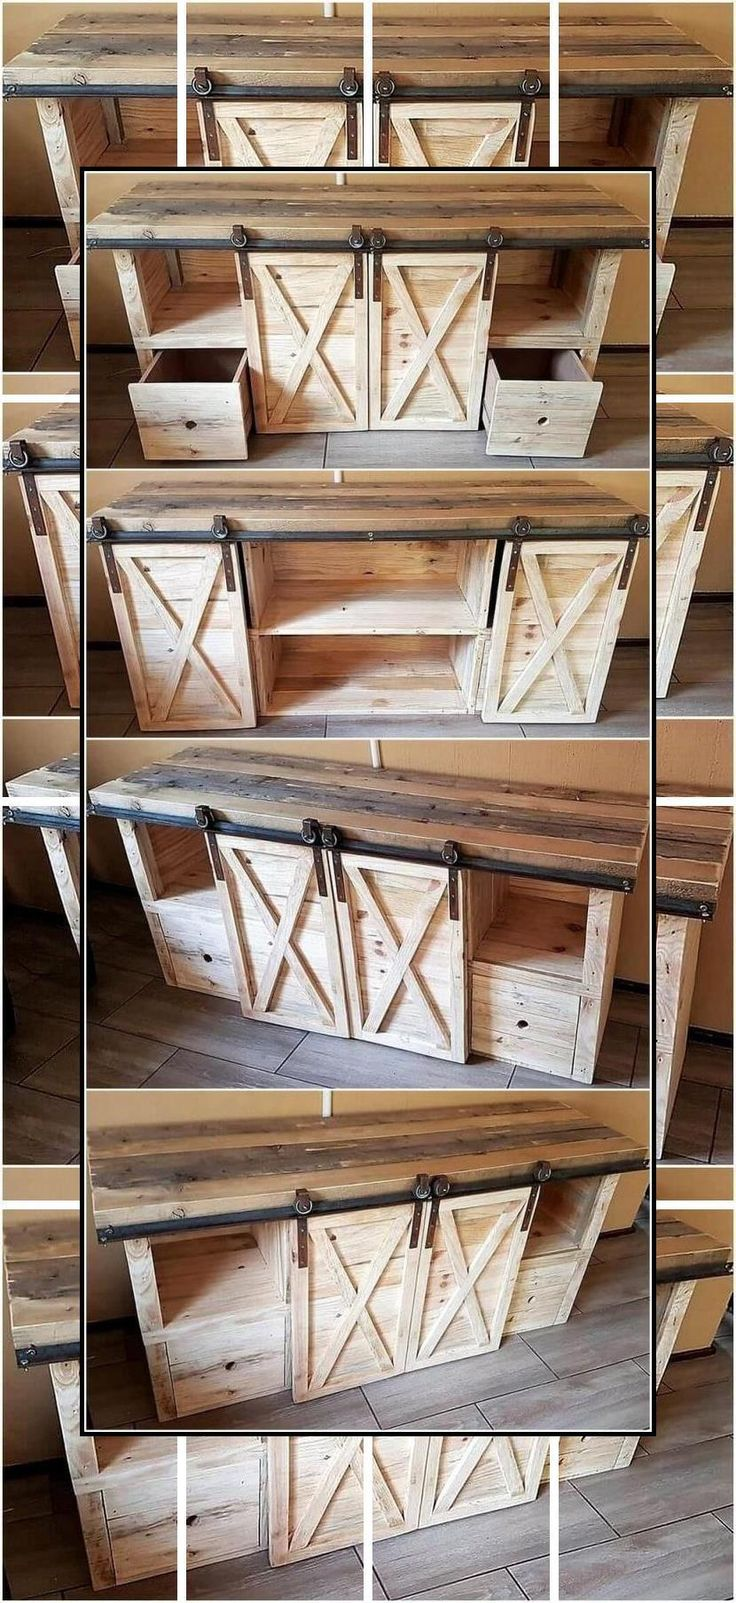 Handmade Pallet Furniture | Standard Pallet Weight ...